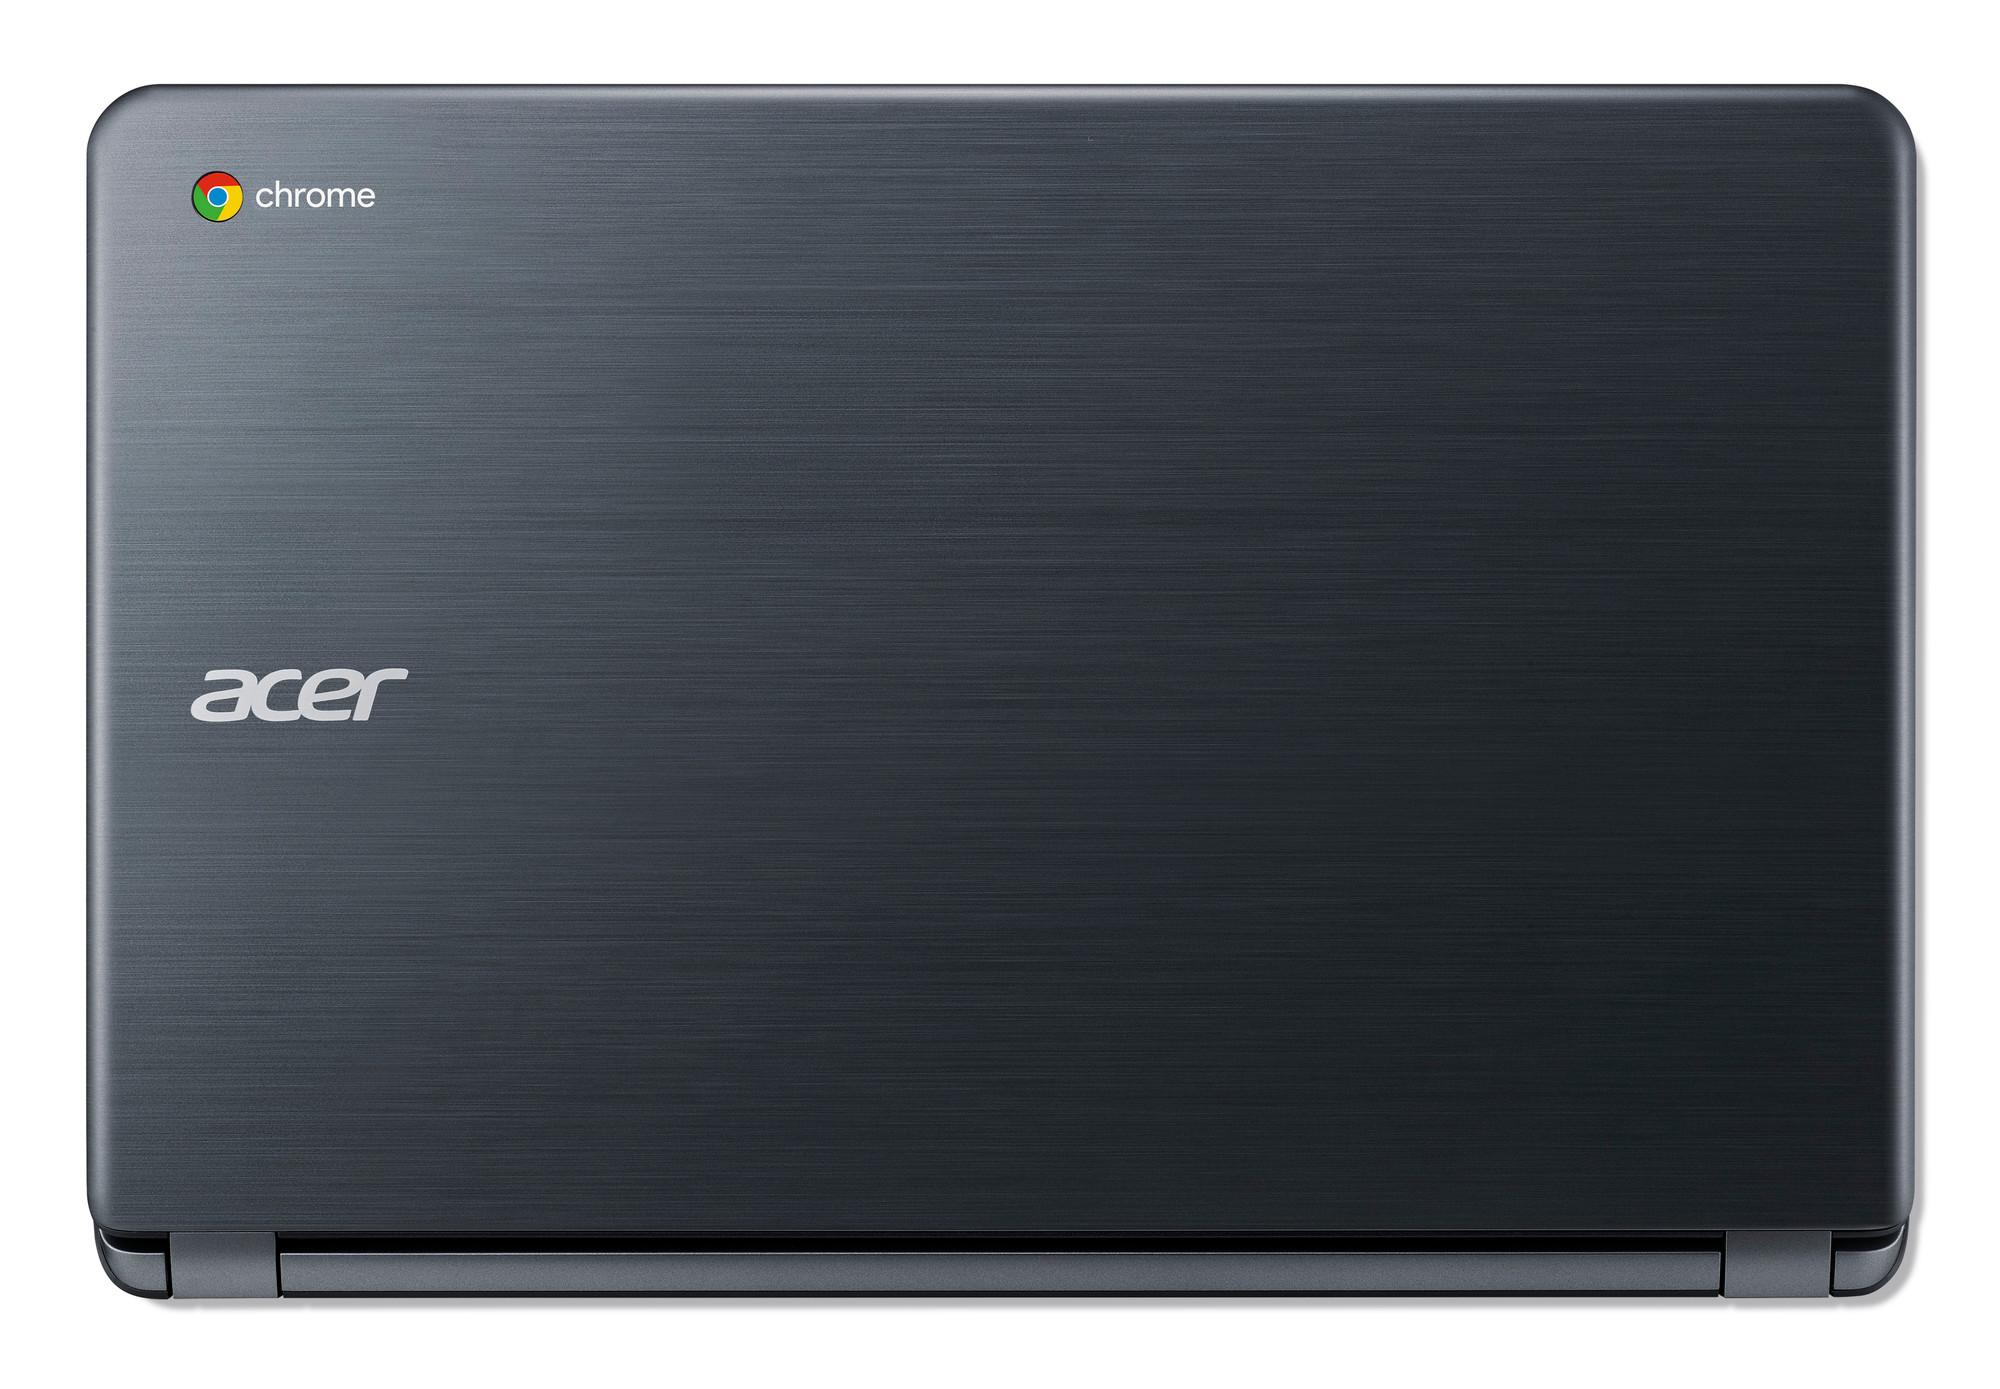 Acer Laptop Intel Celeron 1 60 GHz 2 GB Ram 16GB SSD Chrome OS